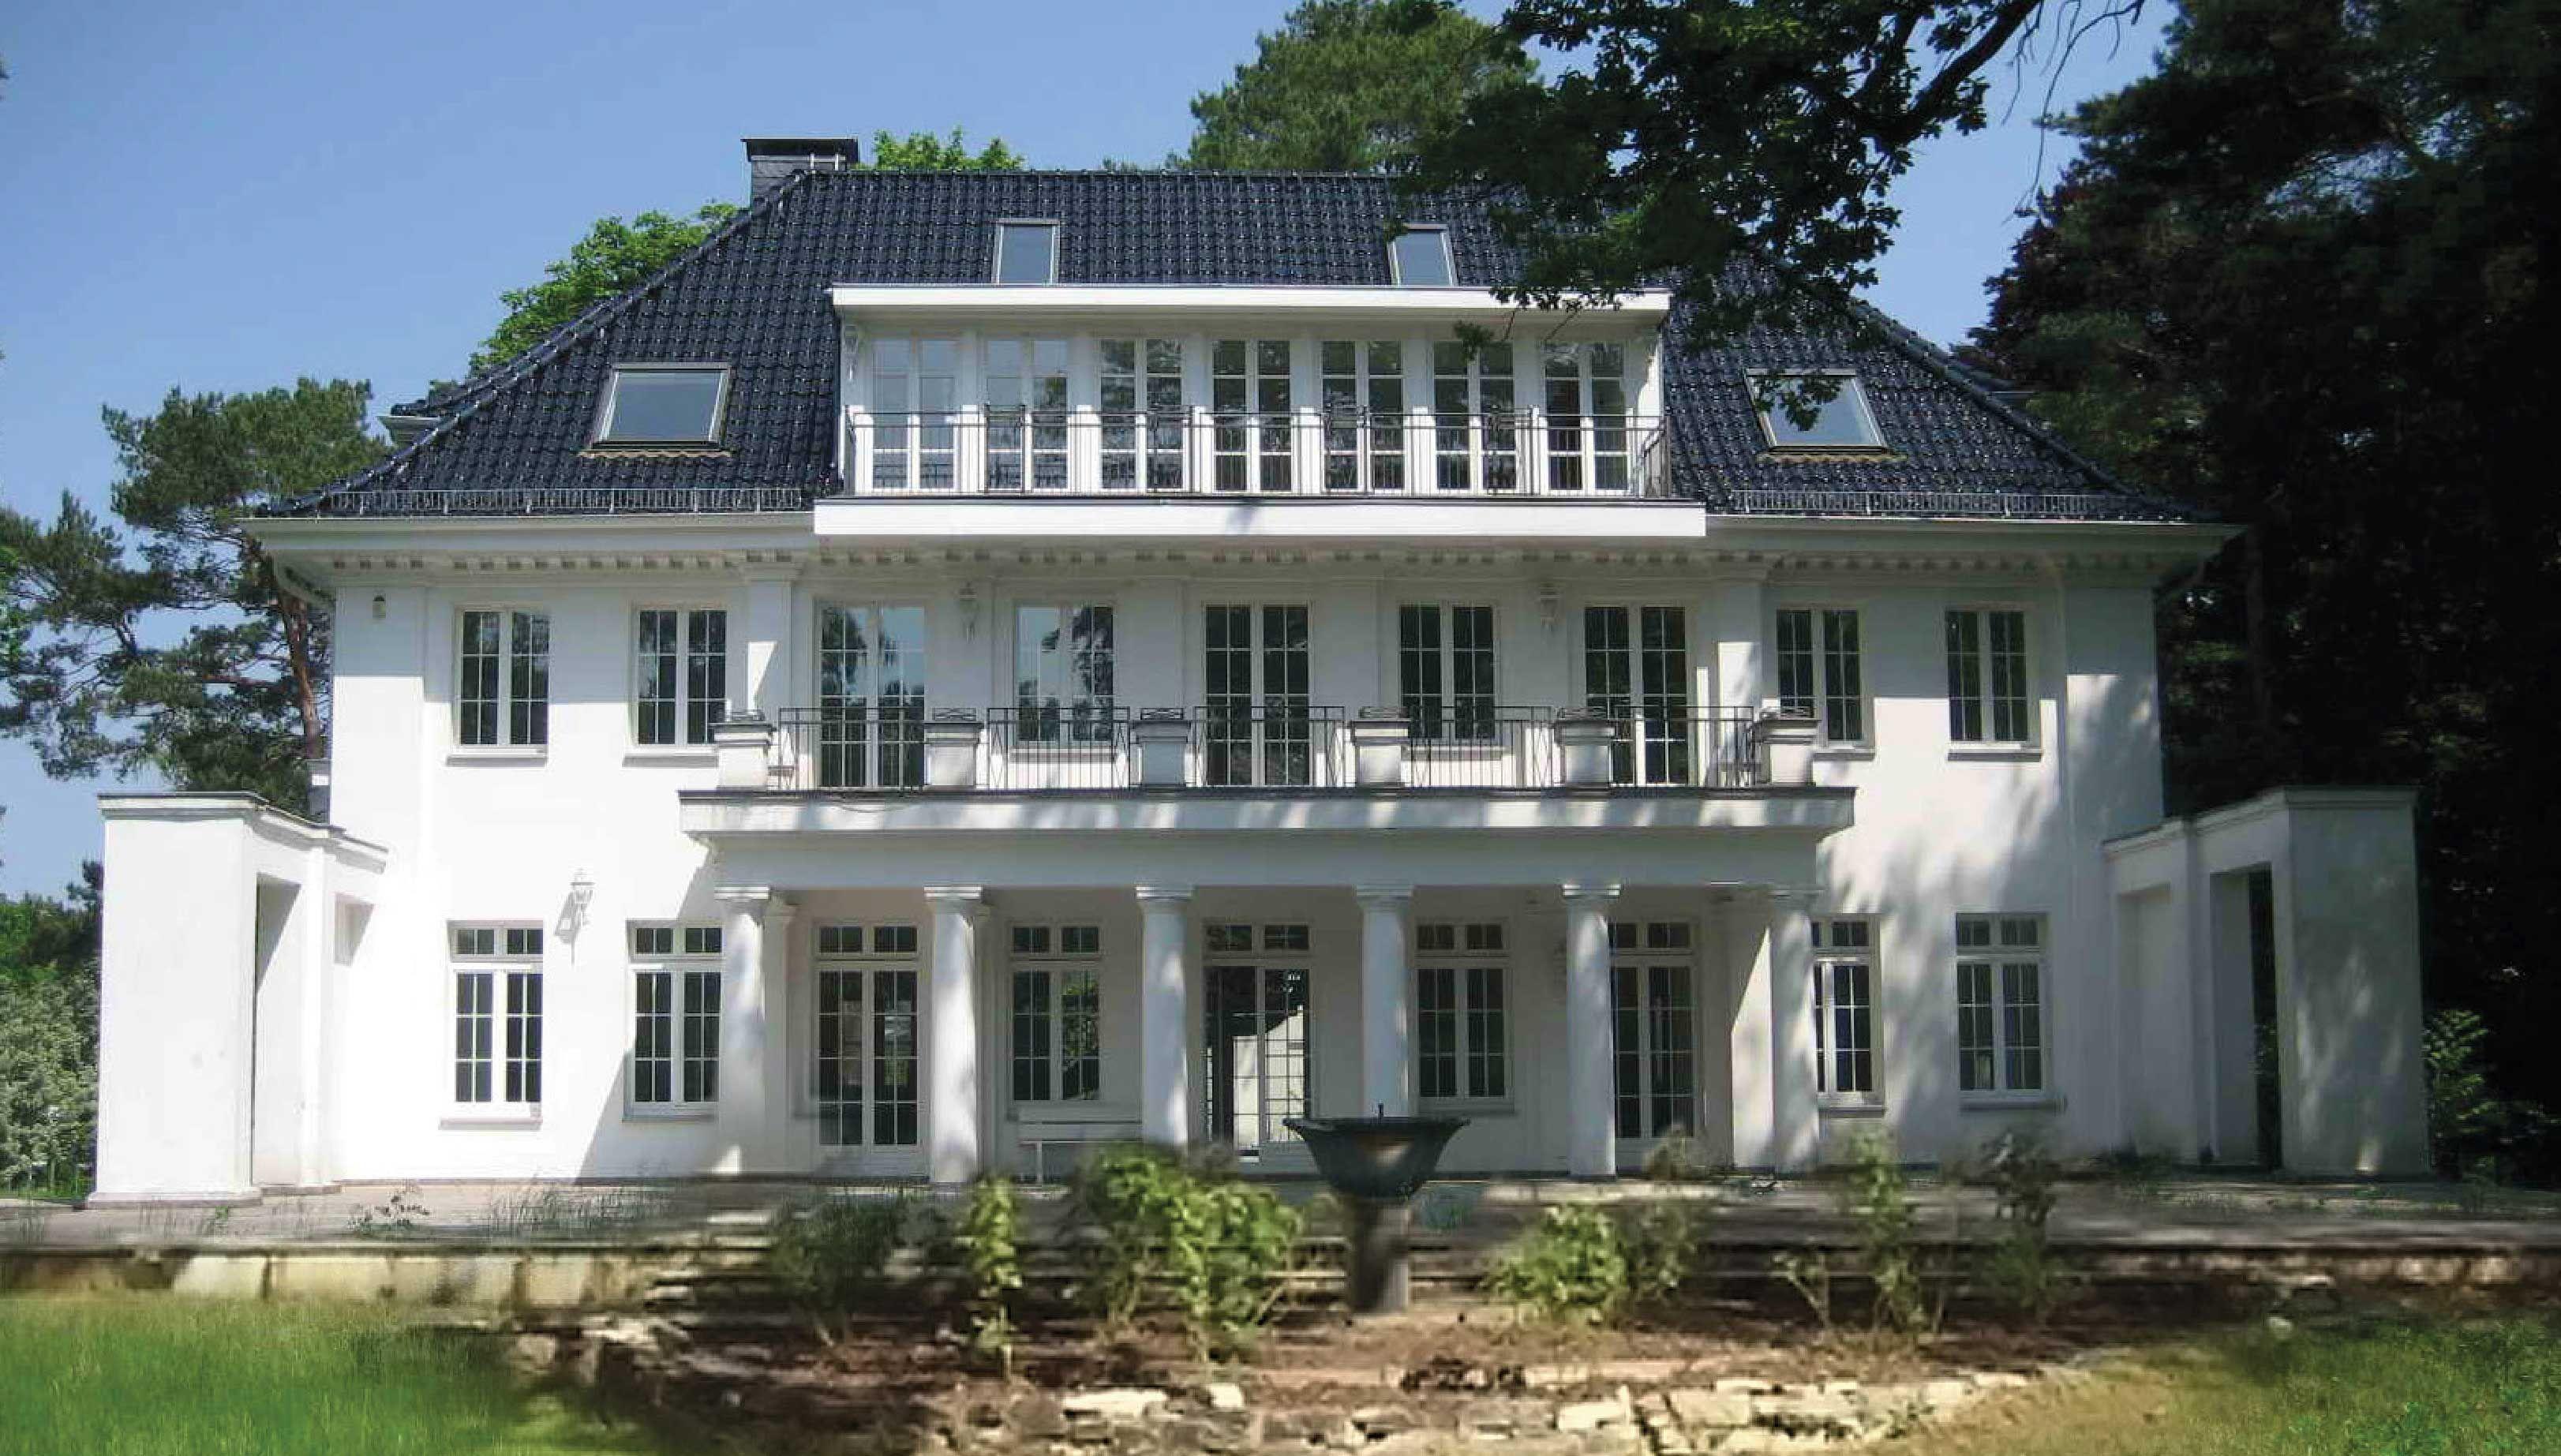 Villa Dahlem premium villa in berlin dahlem germany dahlem luxury homes